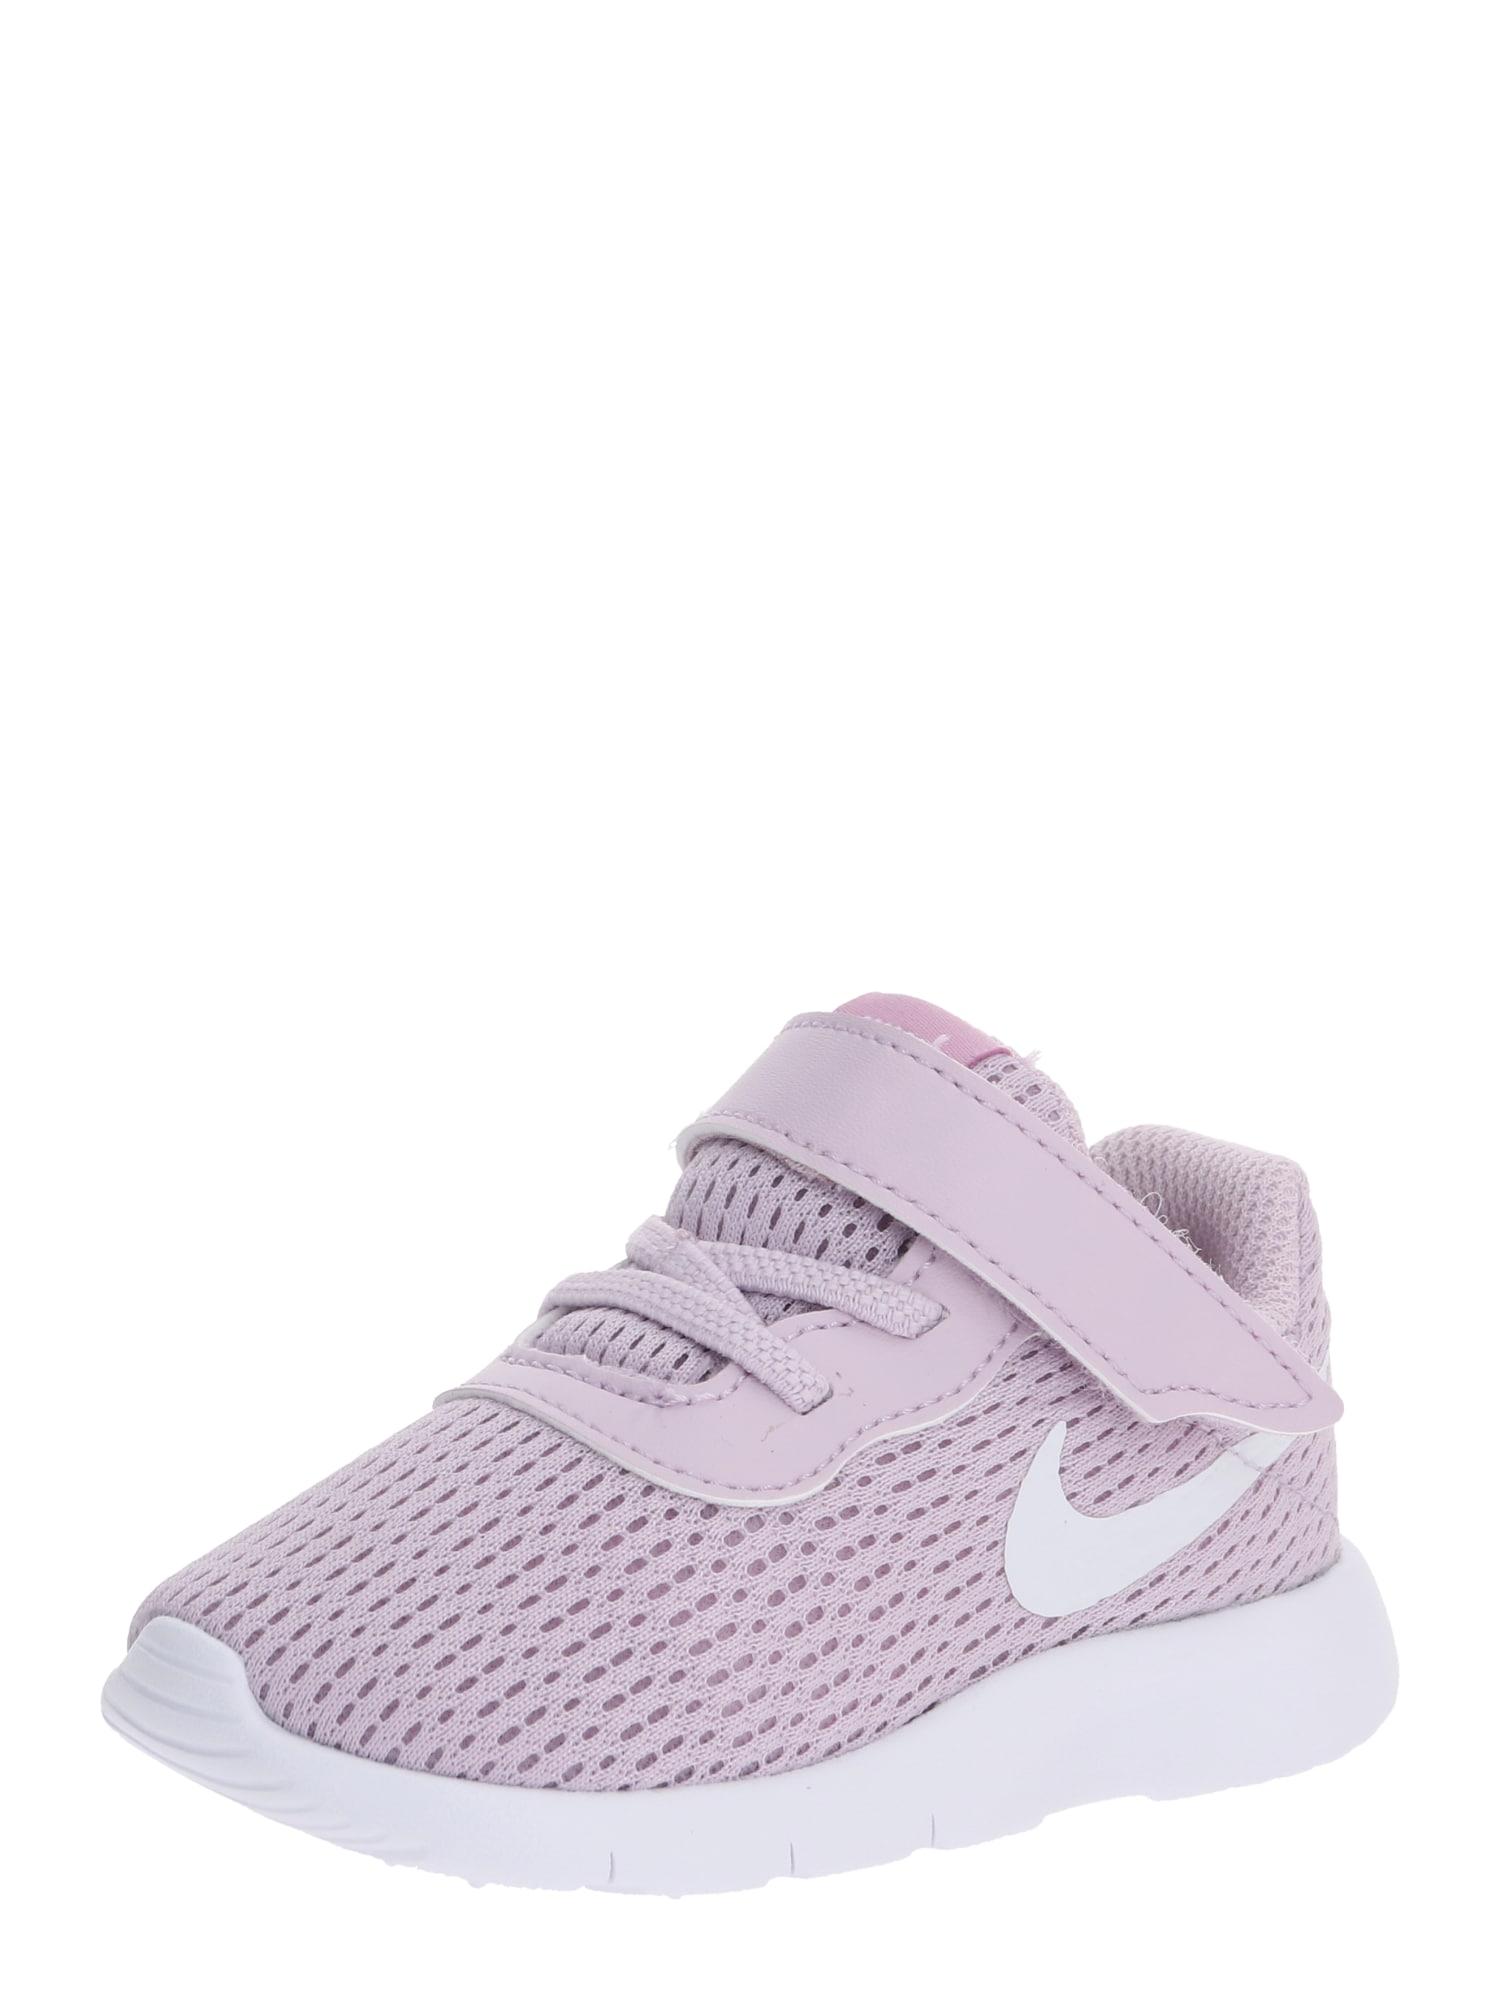 Babyschuhe - Sneaker 'Tanjun' - Onlineshop ABOUT YOU